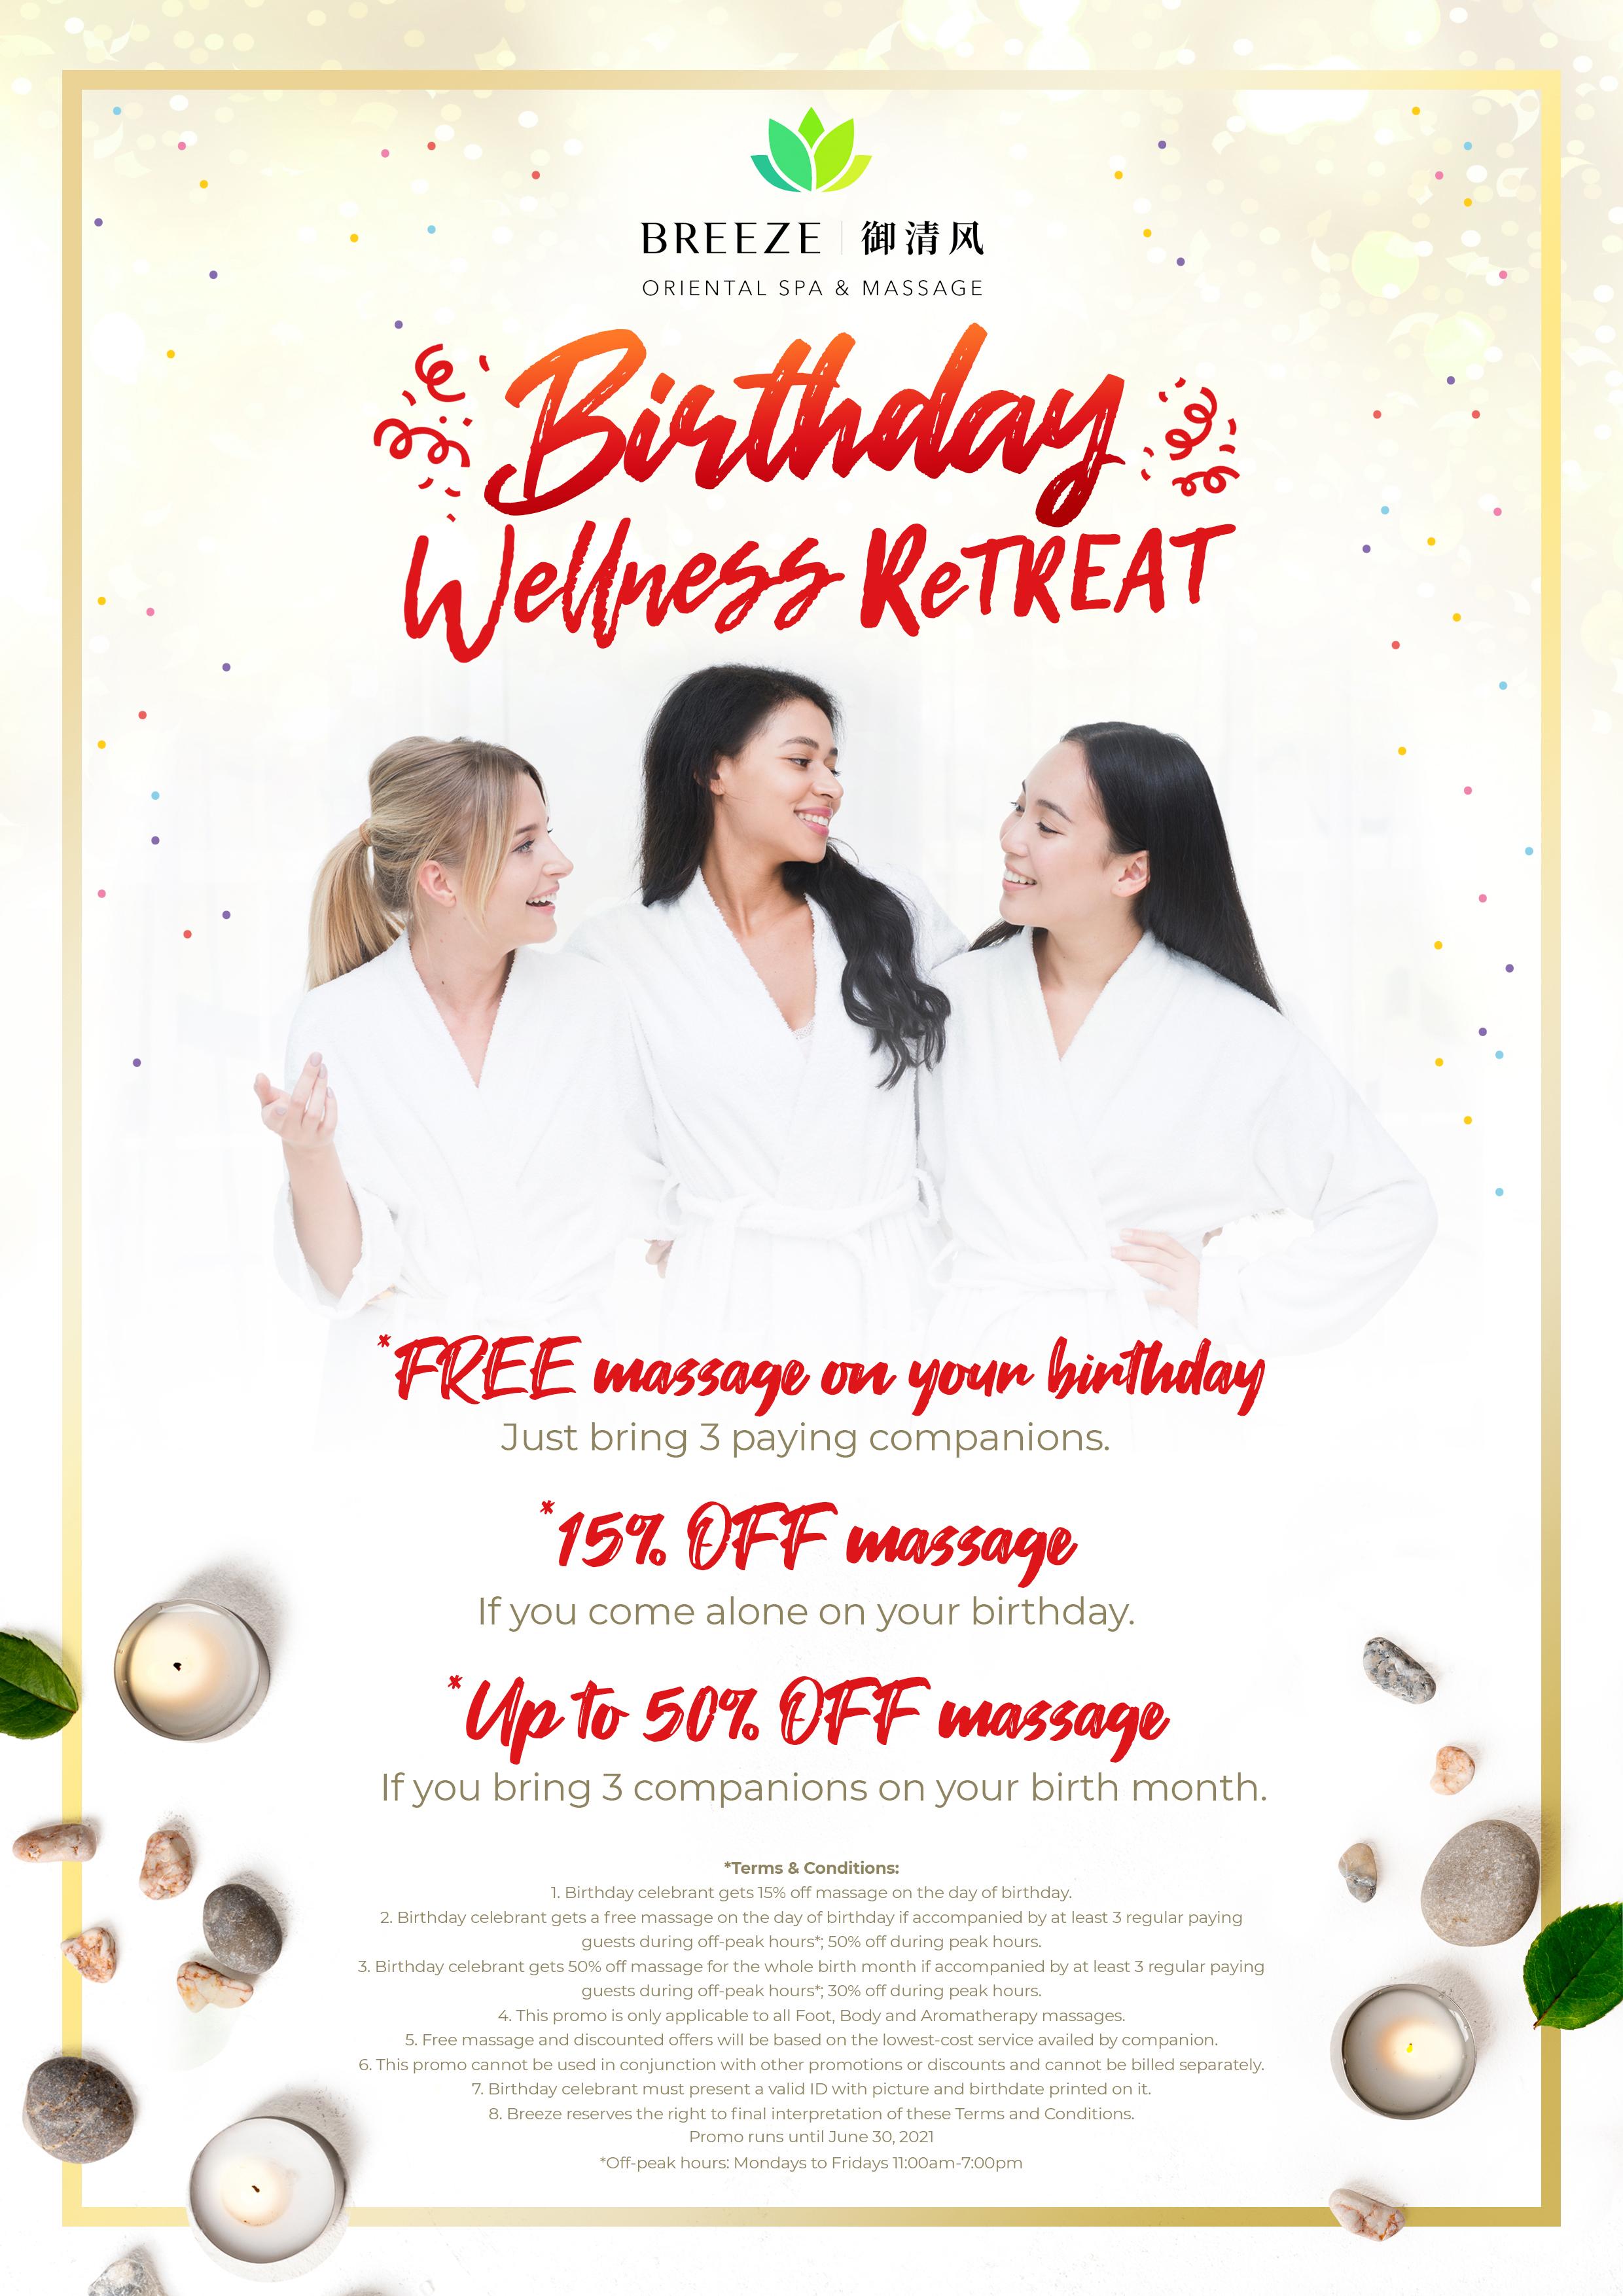 birthday-wellness-treat-promo